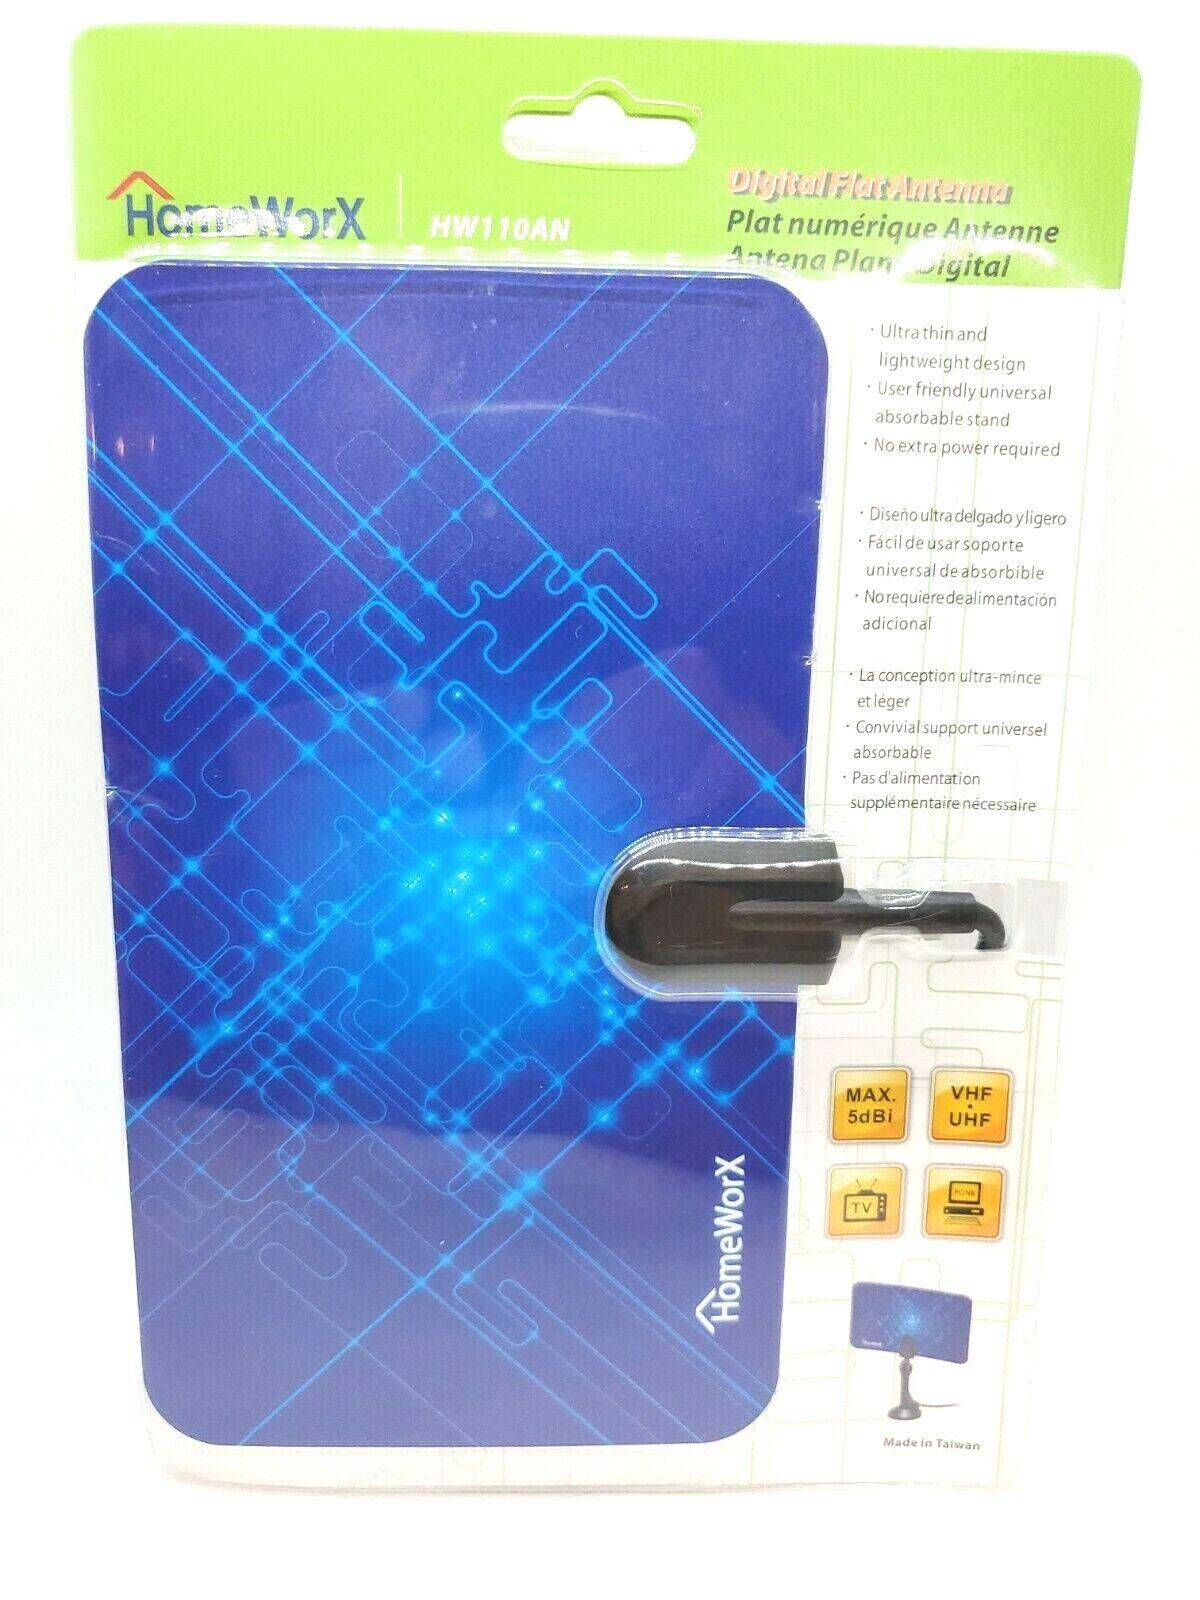 Mediasonic Homeworx HW110AN Super Thin Indoor HDTV Antenna -